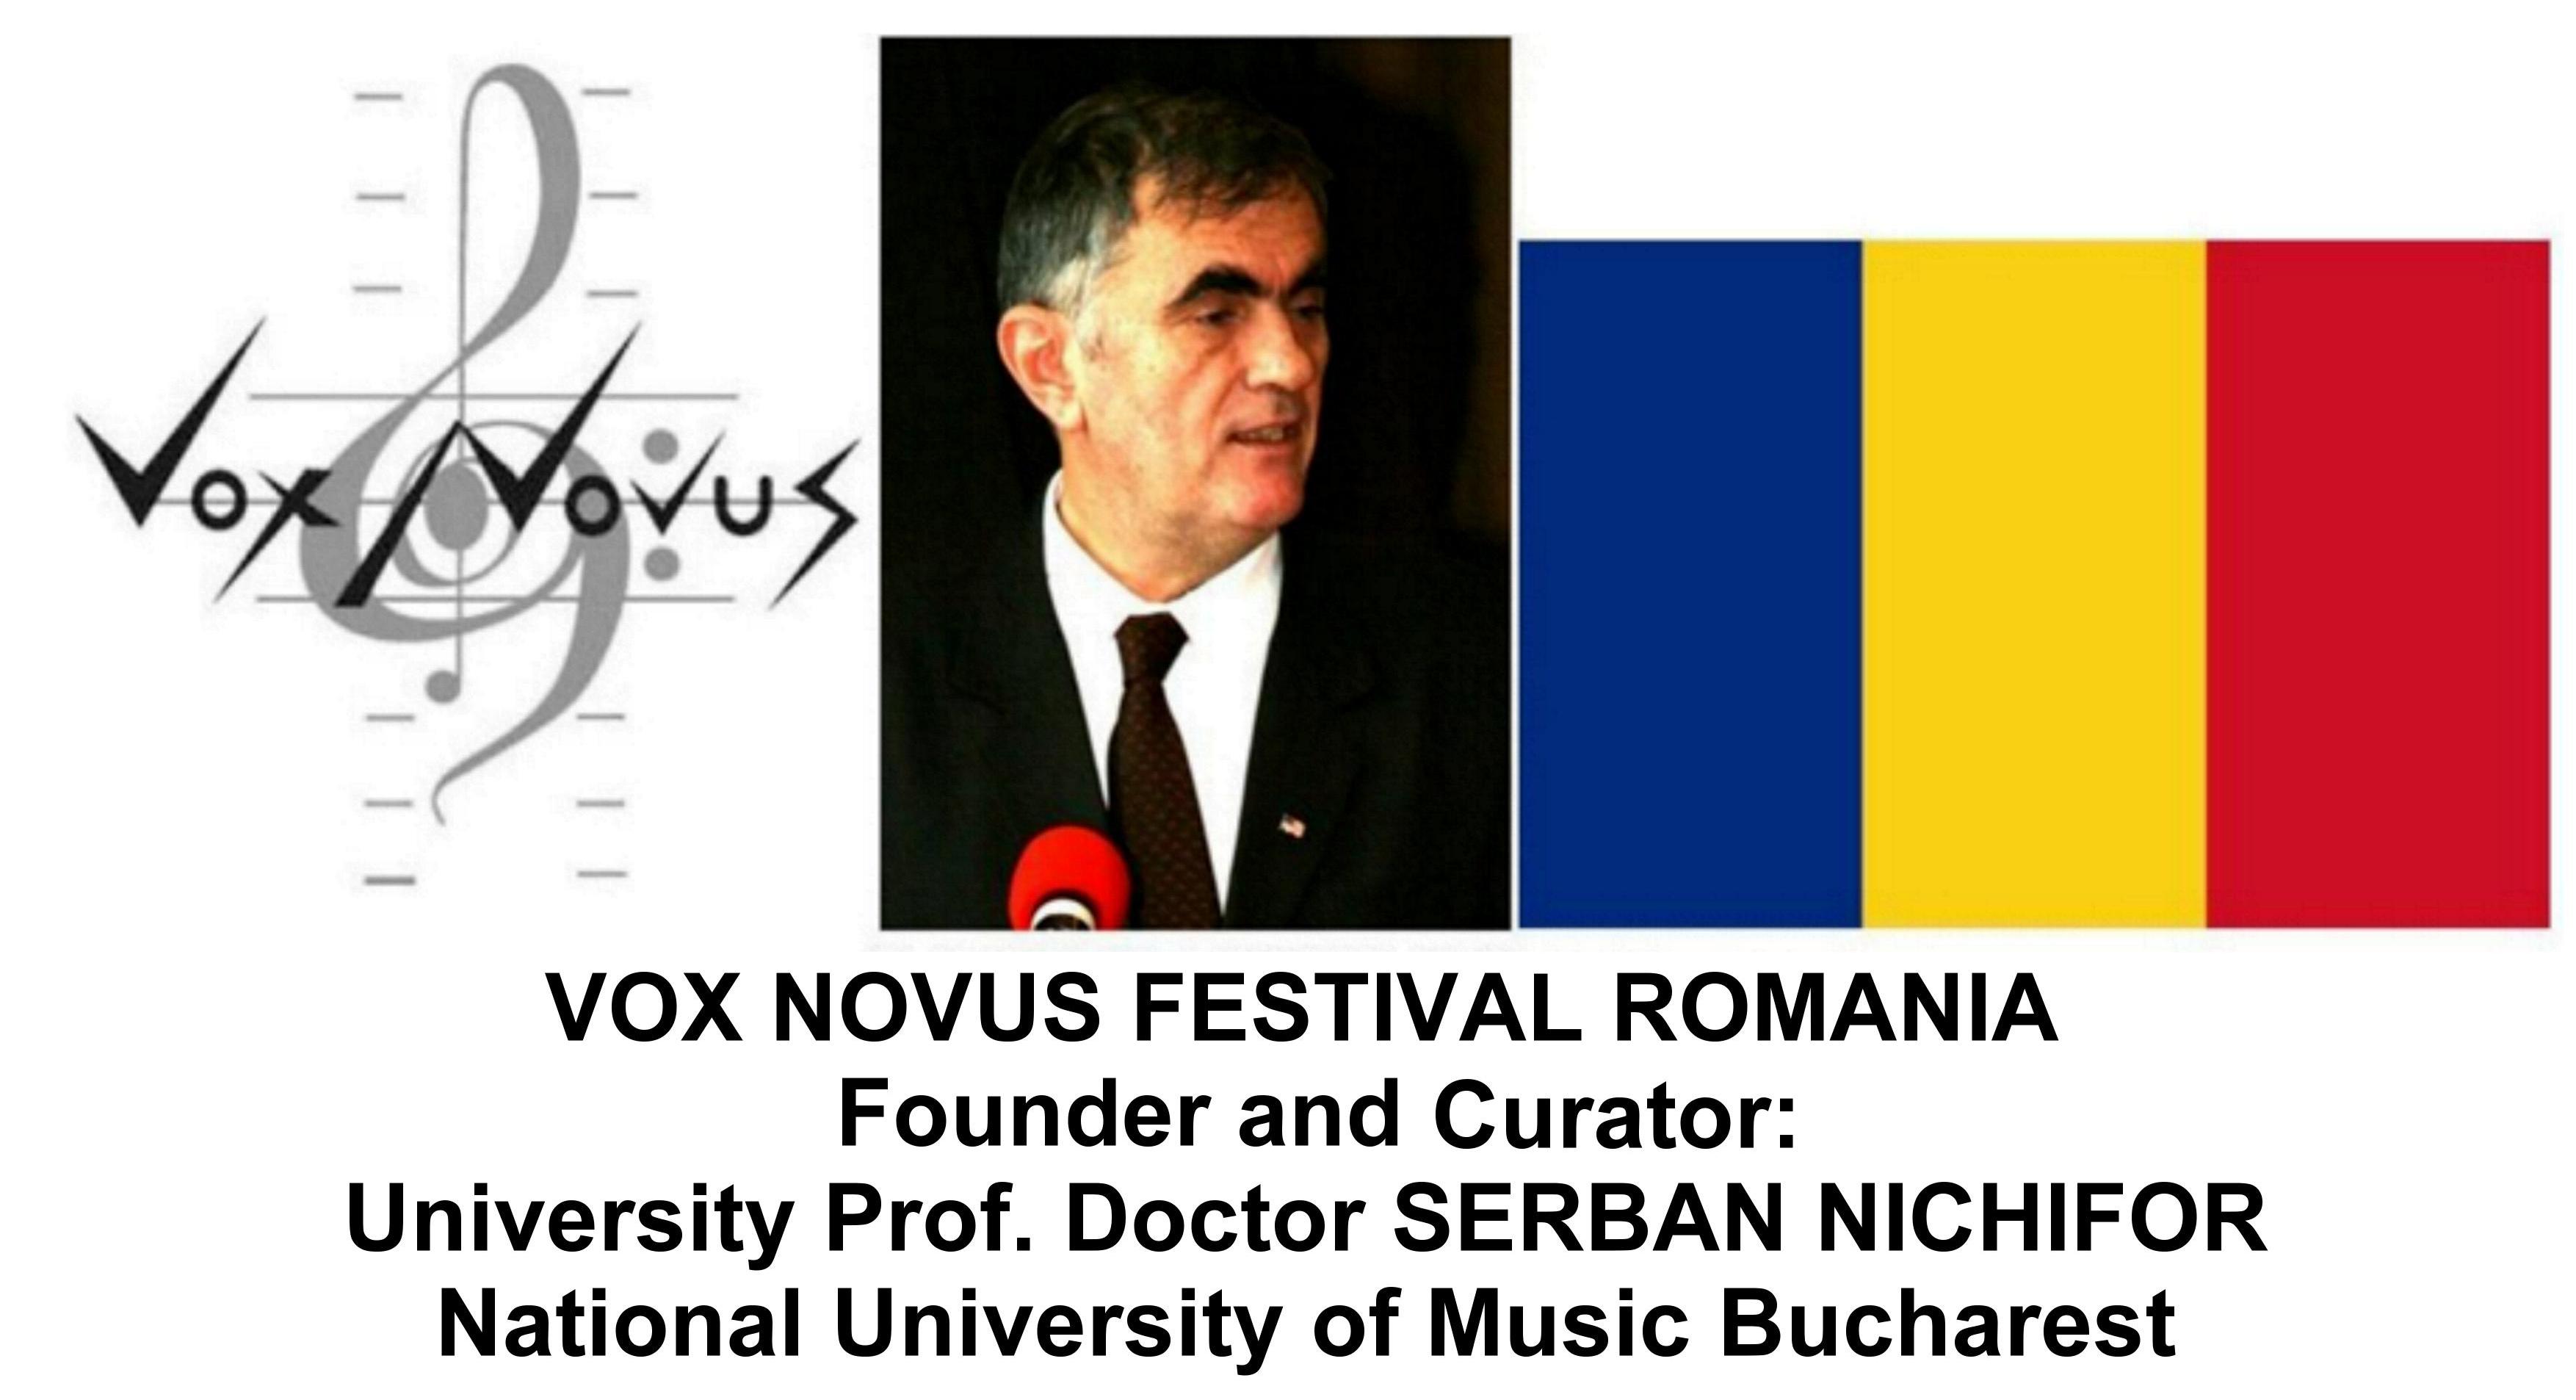 Vox Novus Festival Romania